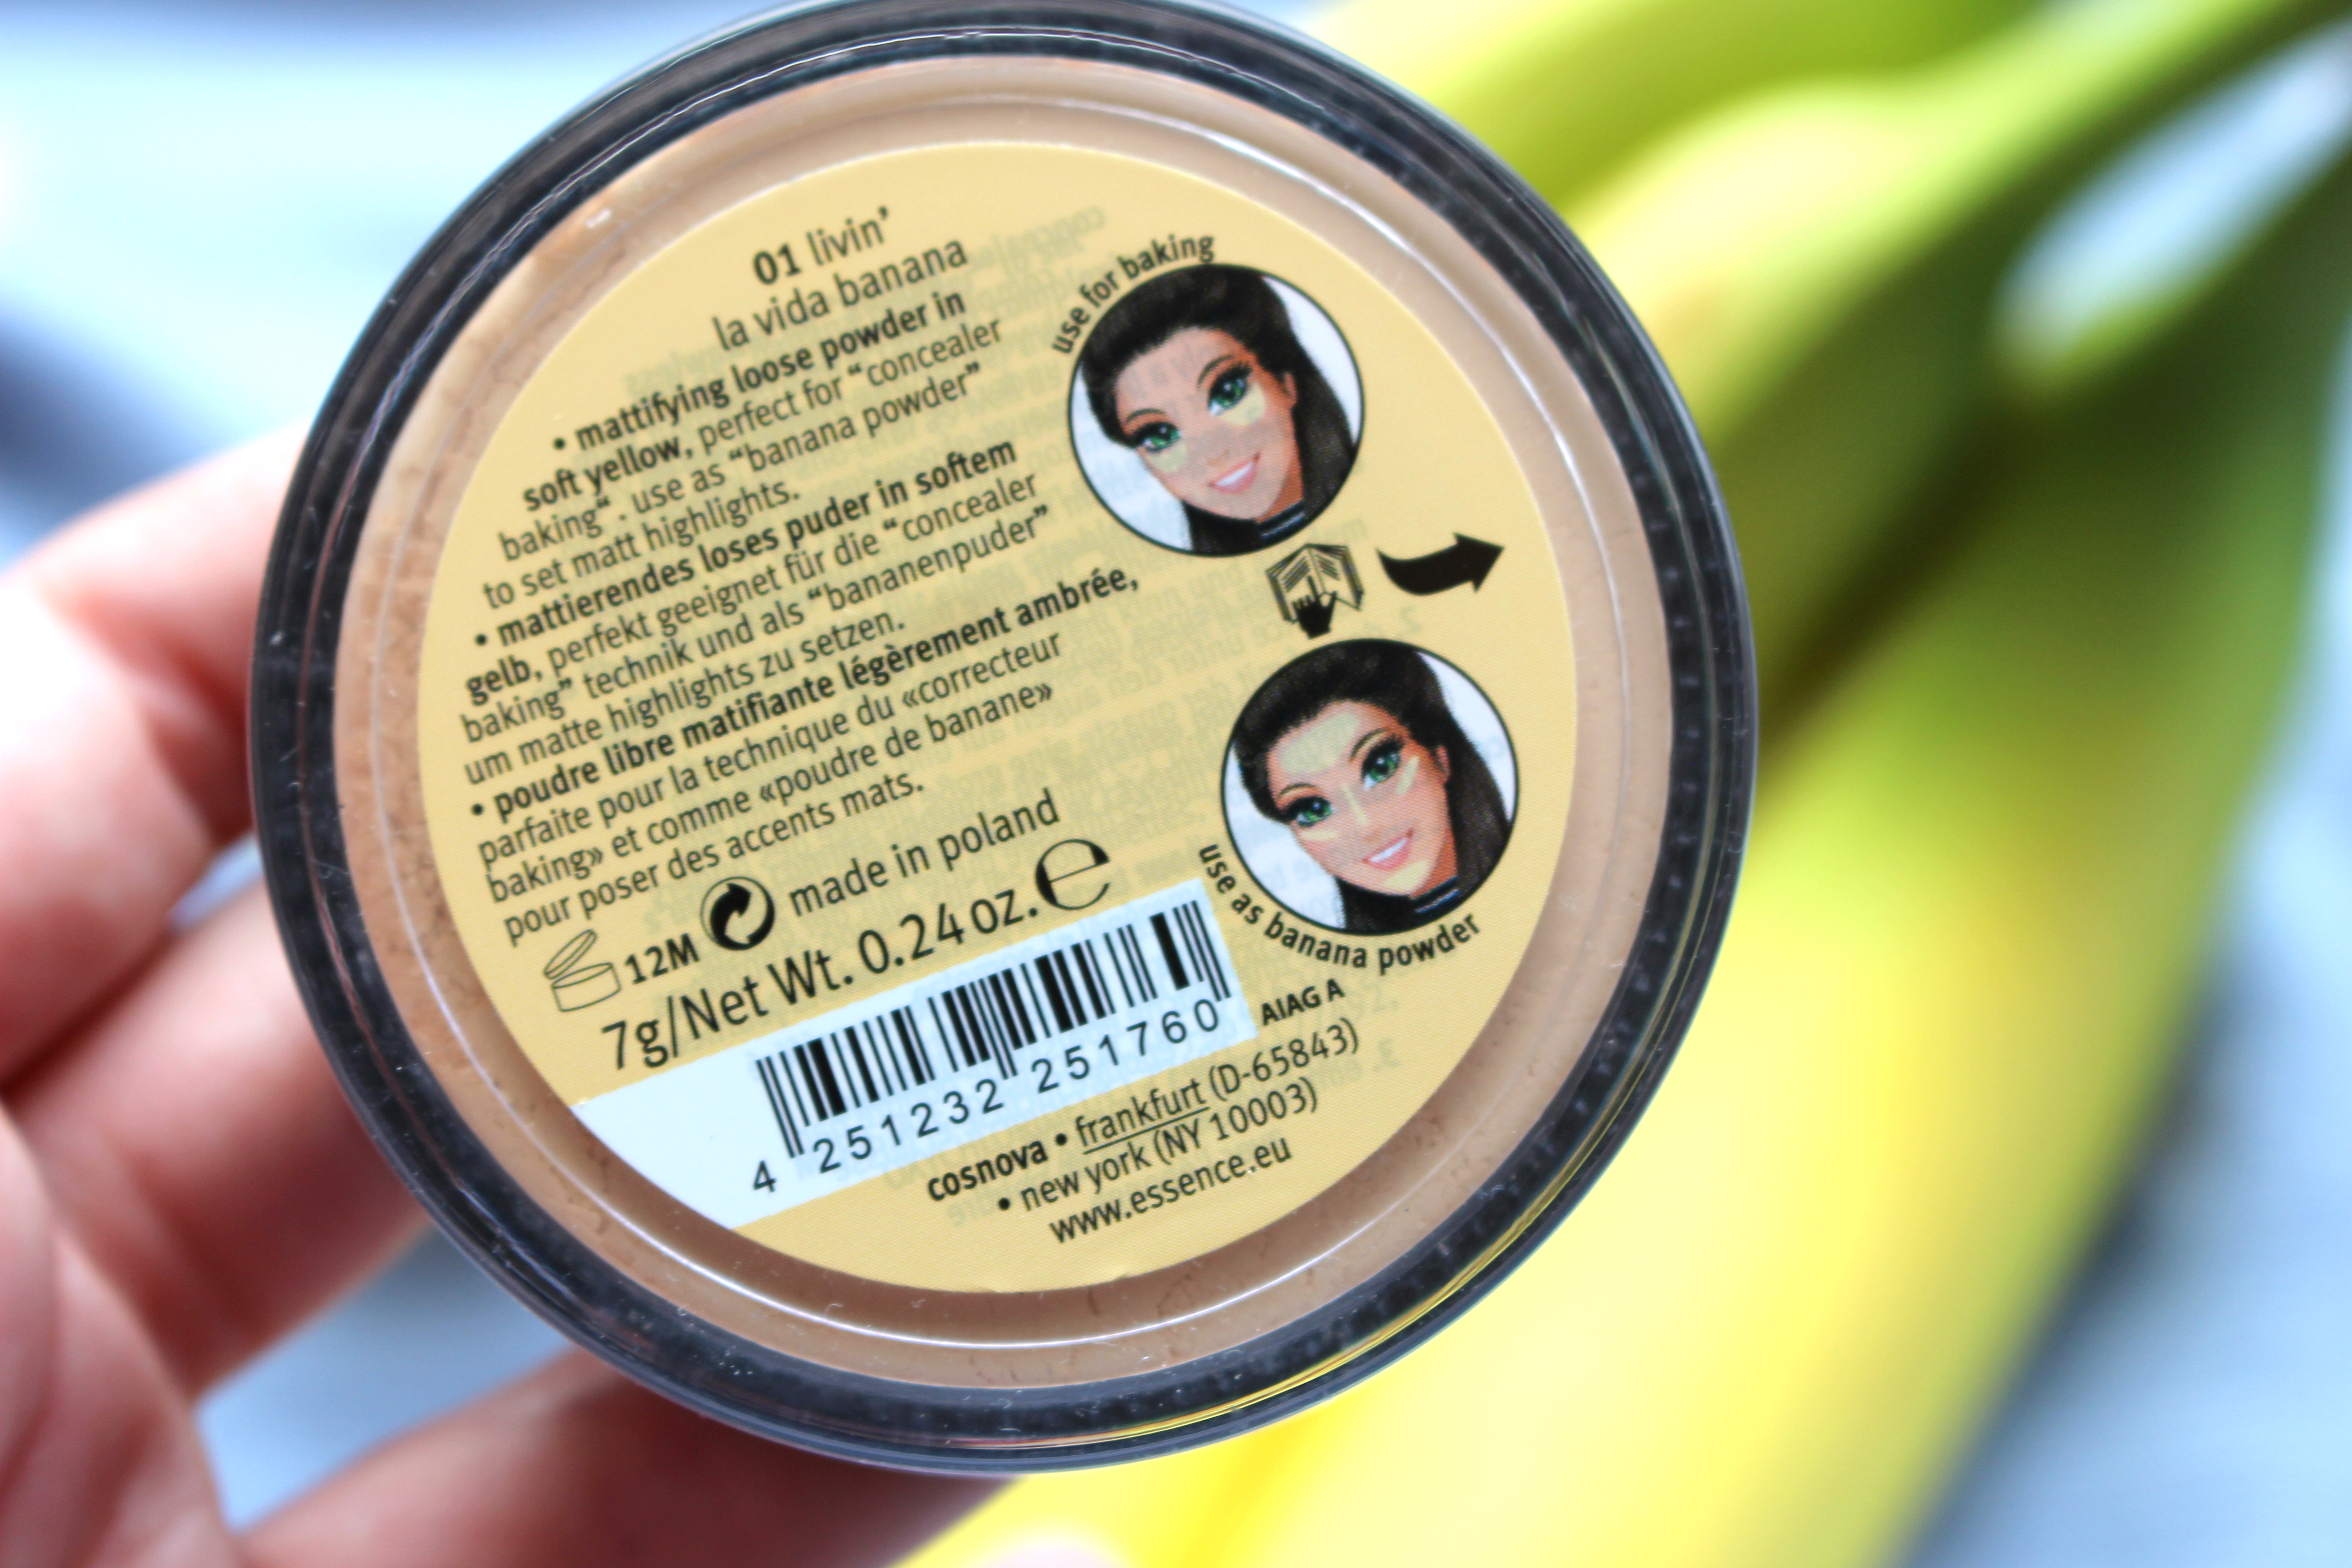 essence_cubanita_makeupinflight_baking_and_banana_powder_3